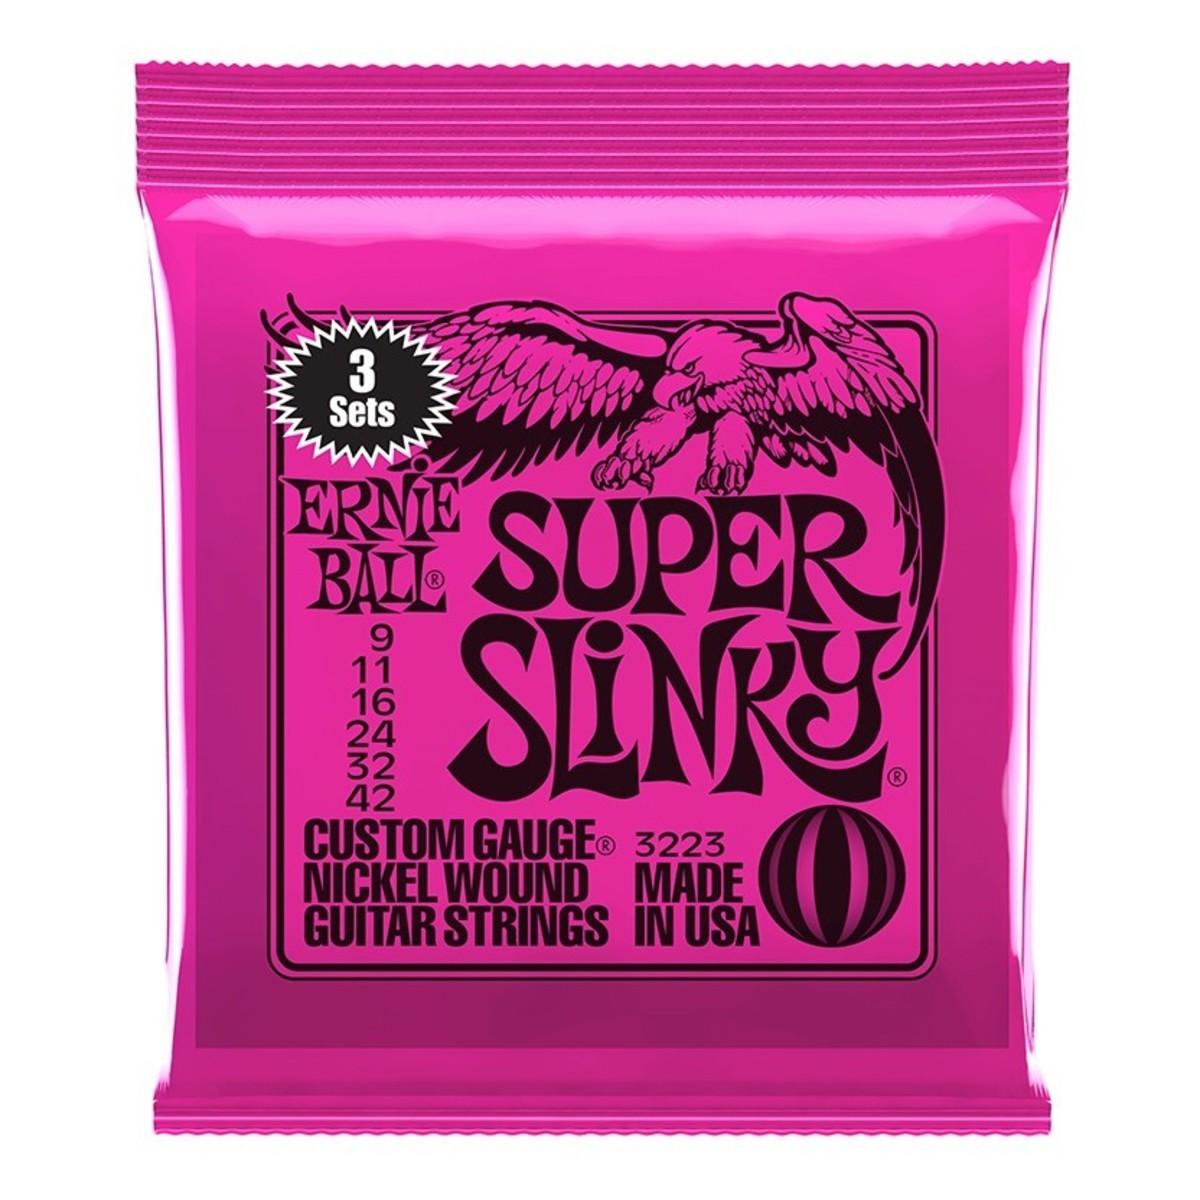 ernie ball super slinky electric guitar strings 3 pack 9 42 at gear4music. Black Bedroom Furniture Sets. Home Design Ideas